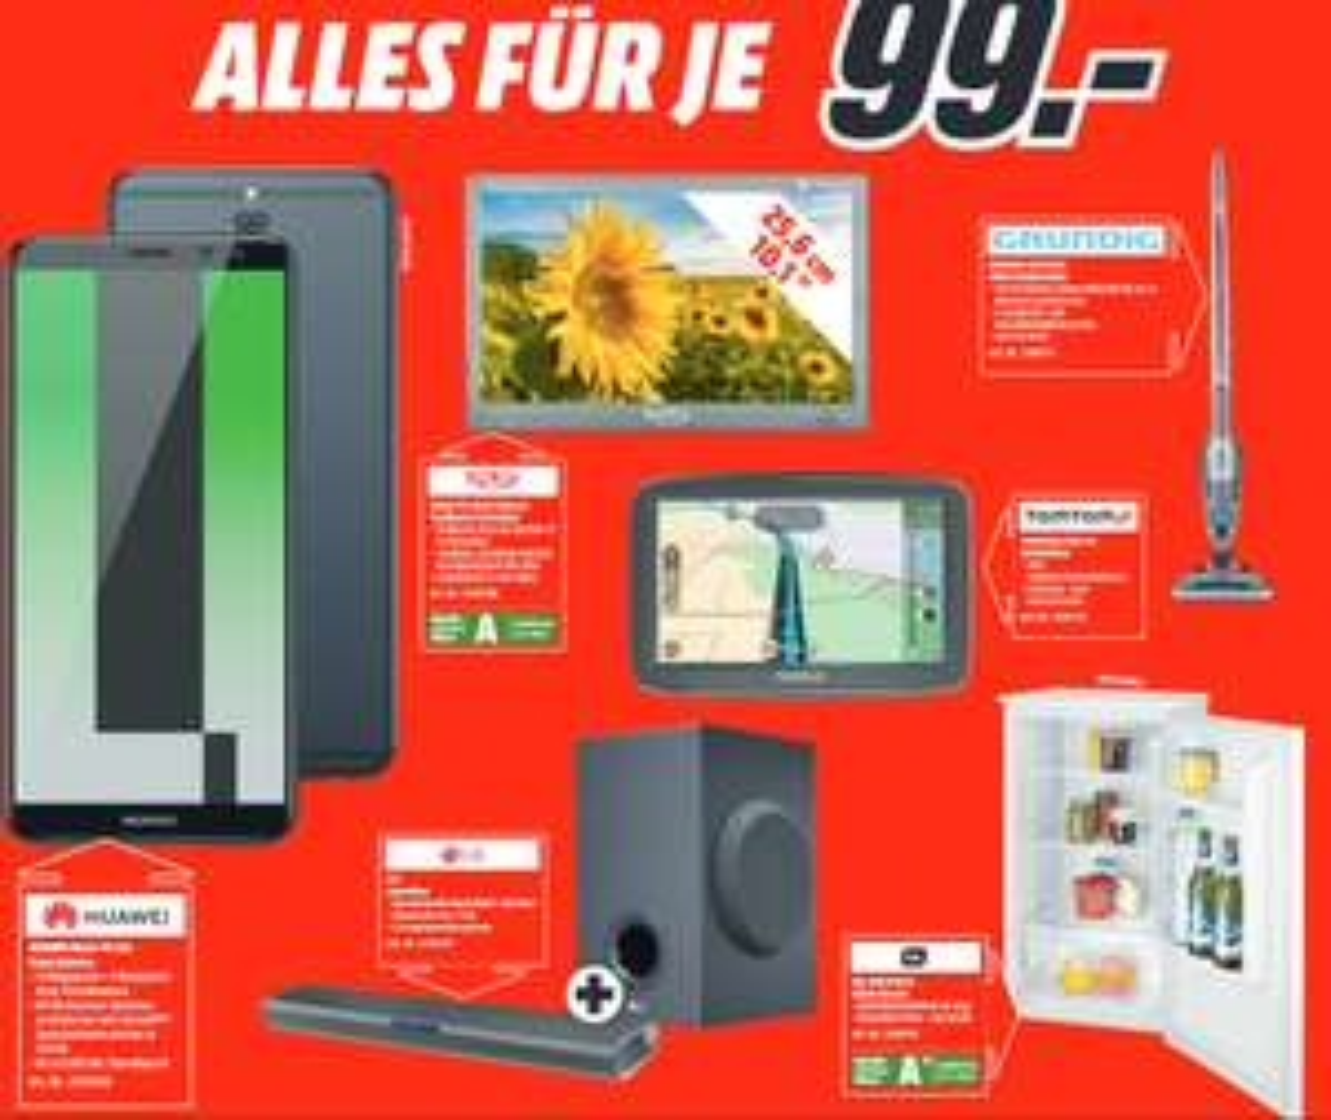 [Lokal: Media Markt Castrop-Rauxel] HUAWEI Mate 10 lite 64GB Dual SIM | SONY WH-XB900N Over-ear Noise Cancelling Kopfhörer für 149€